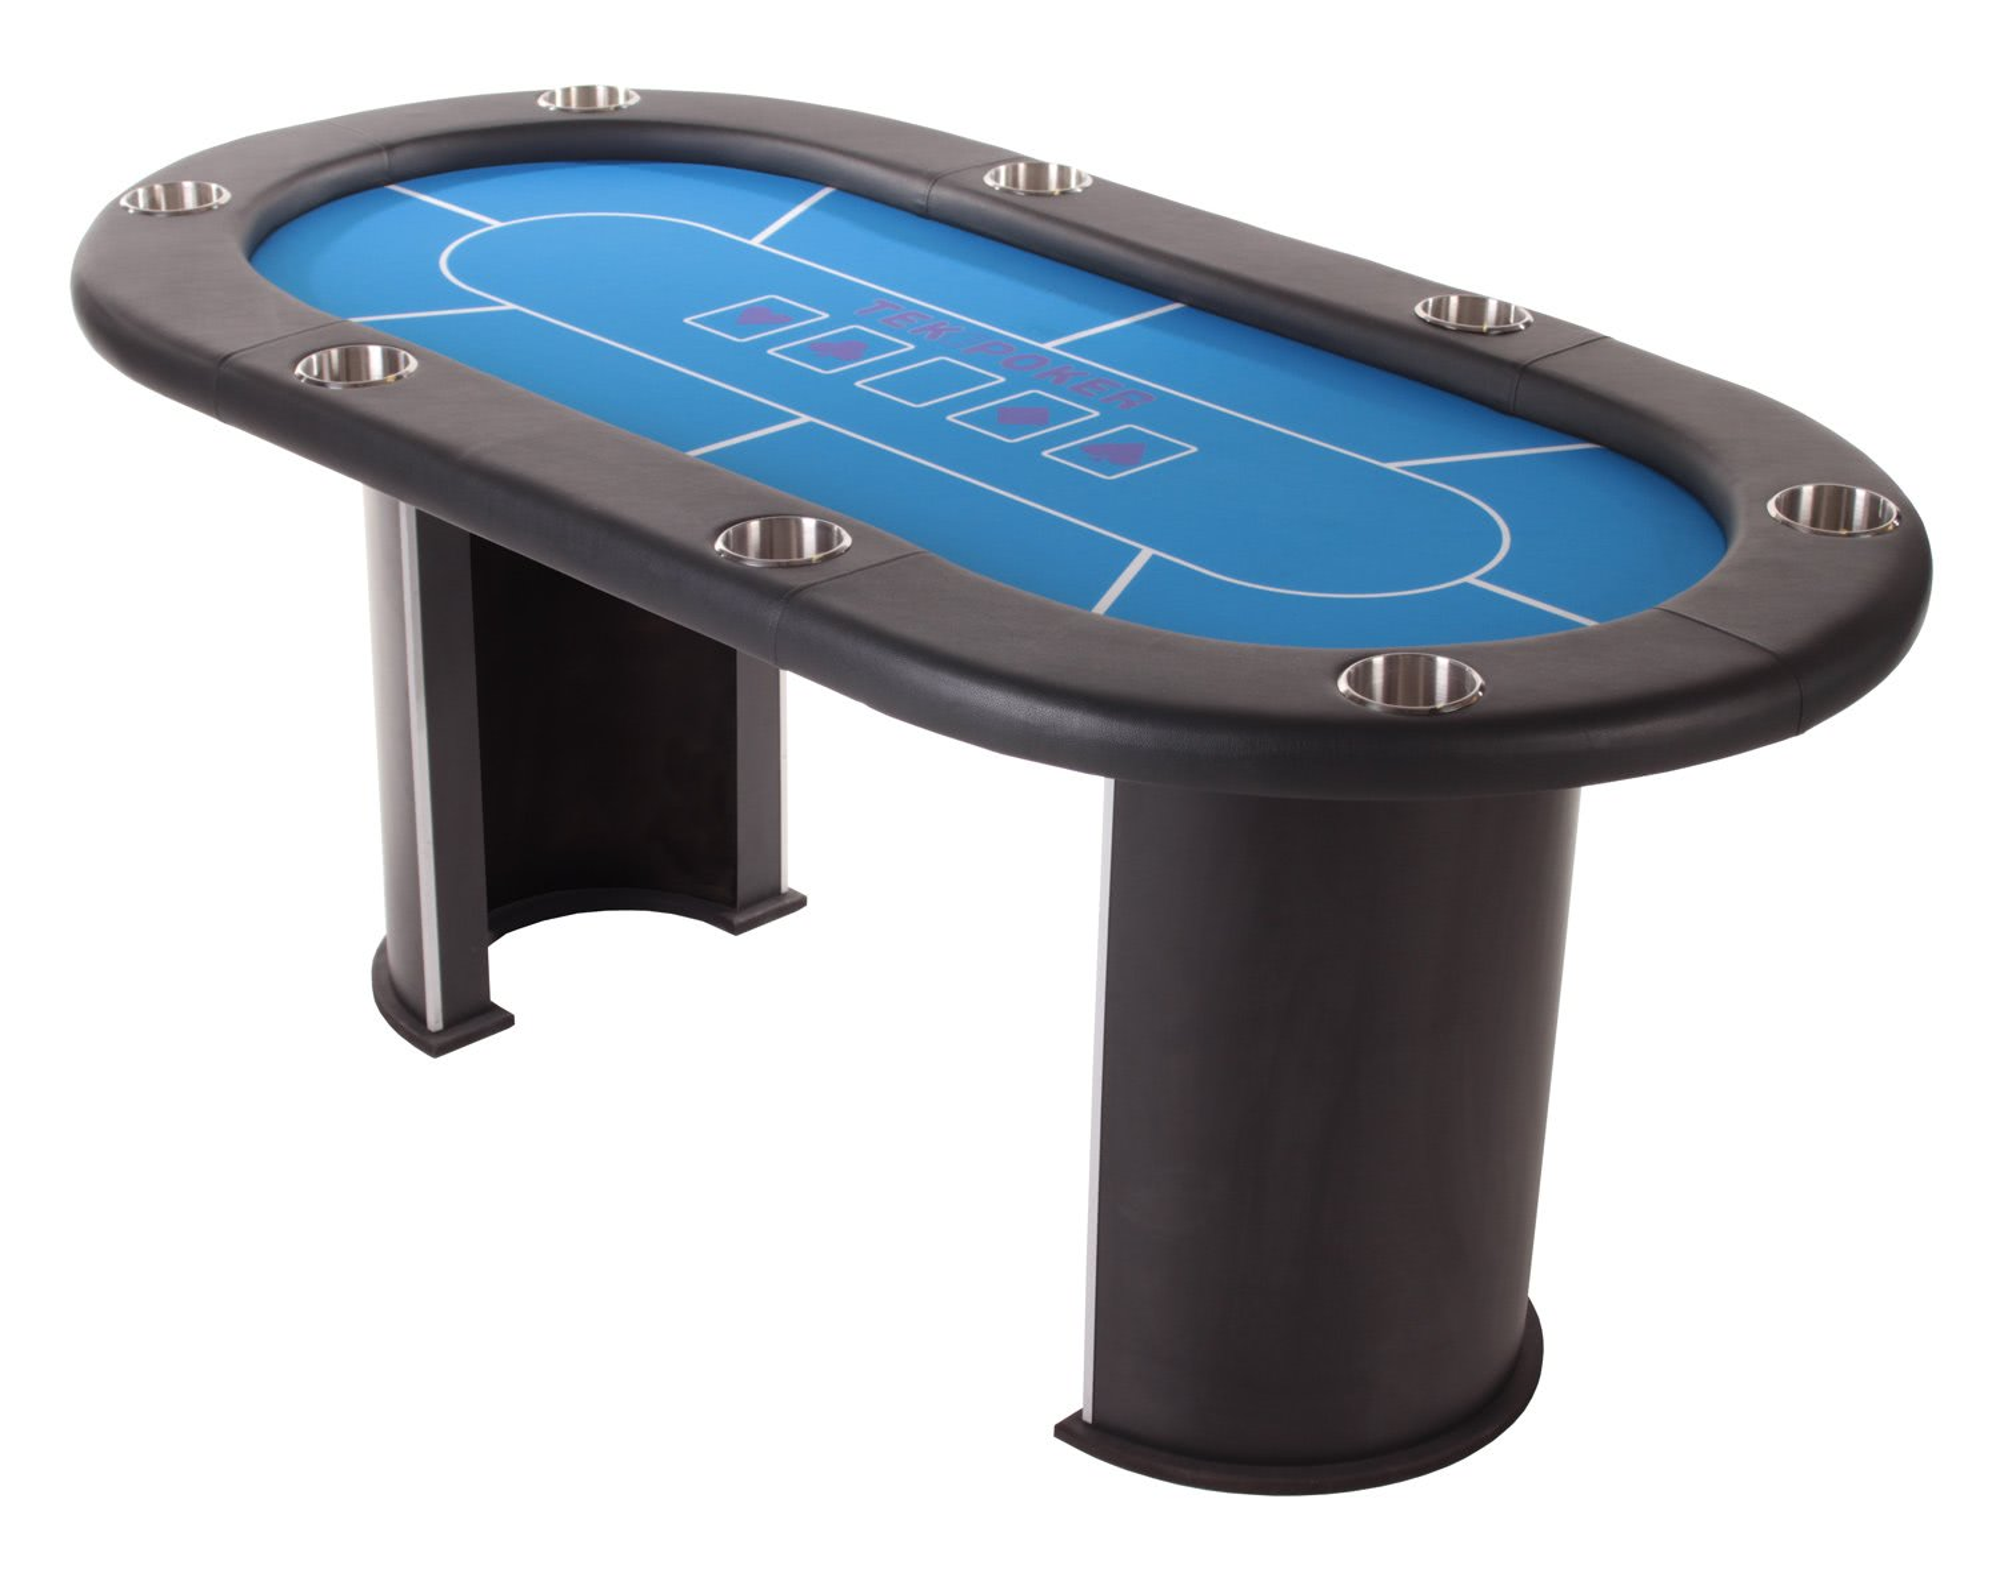 Poker table legs for sale